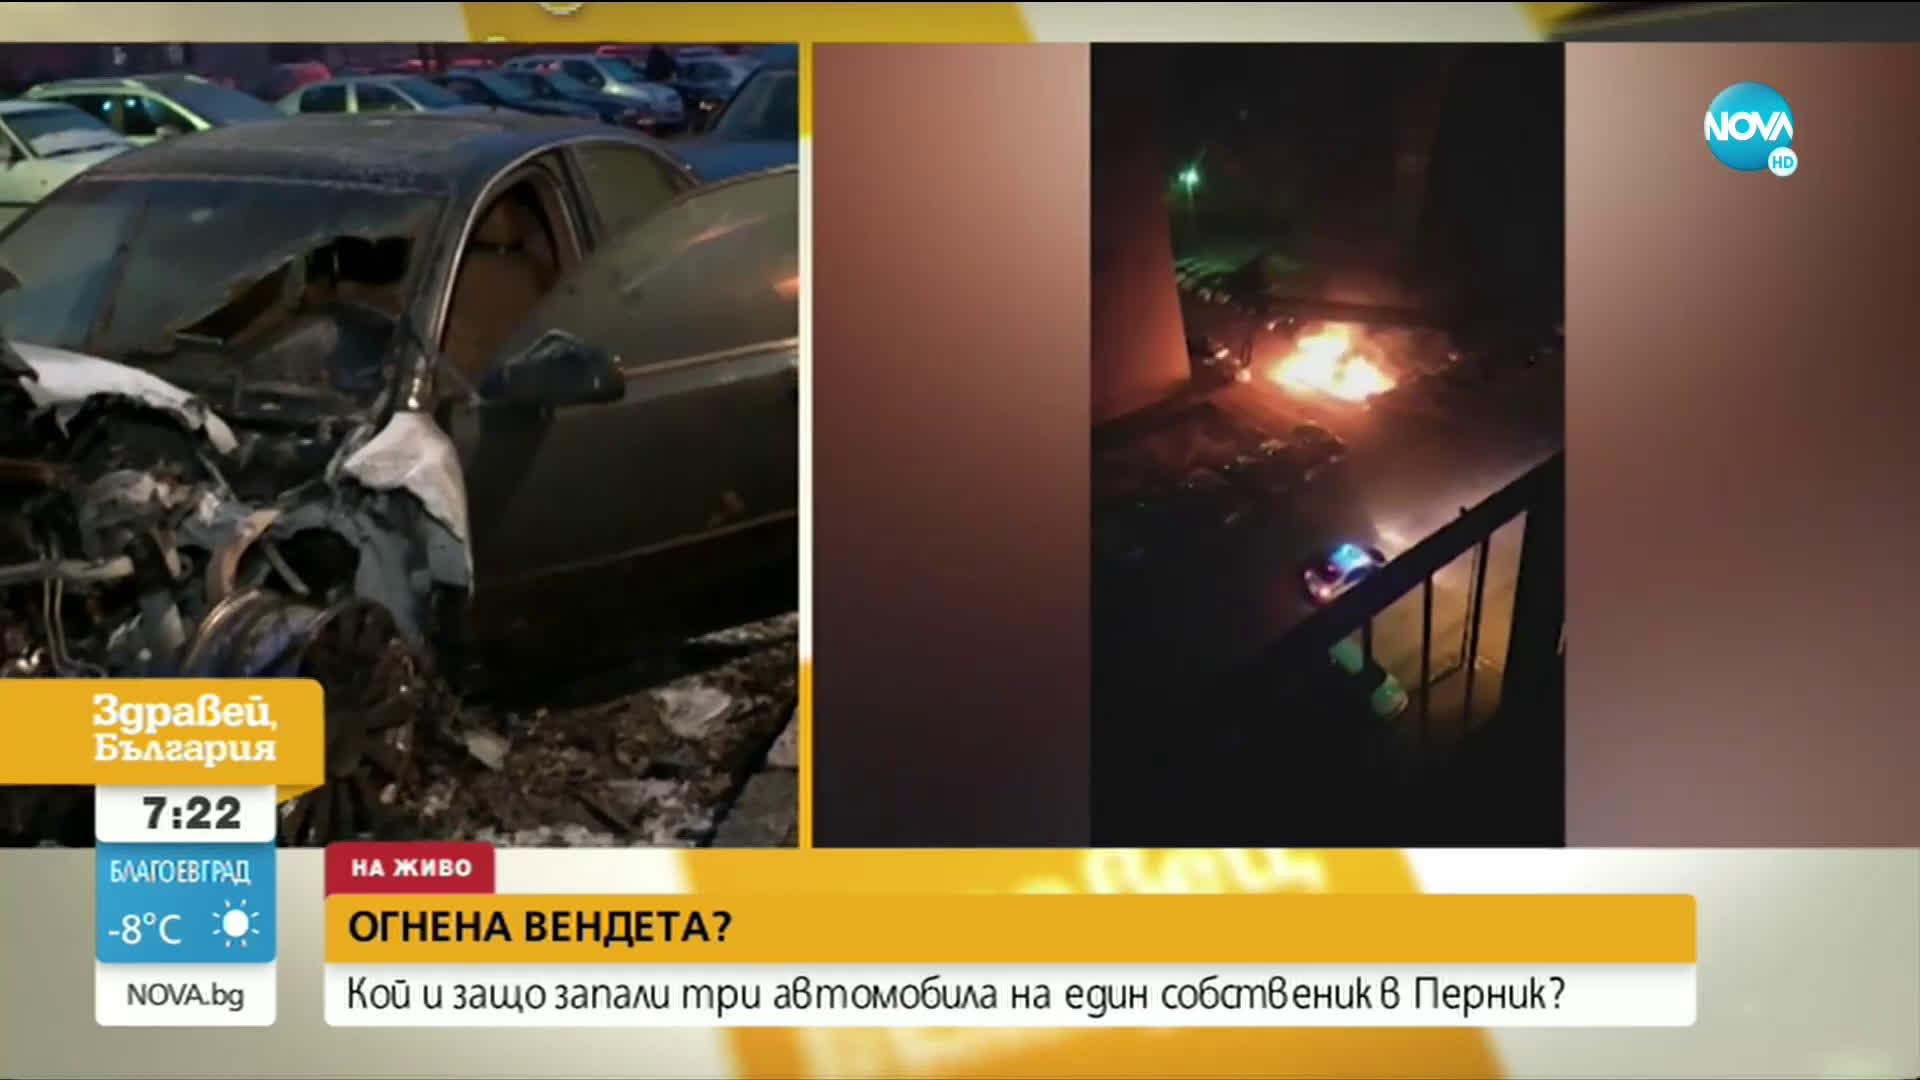 ОГНЕНА ВЕНДЕТА: Автомобили изгоряха до основи в пернишки квартал